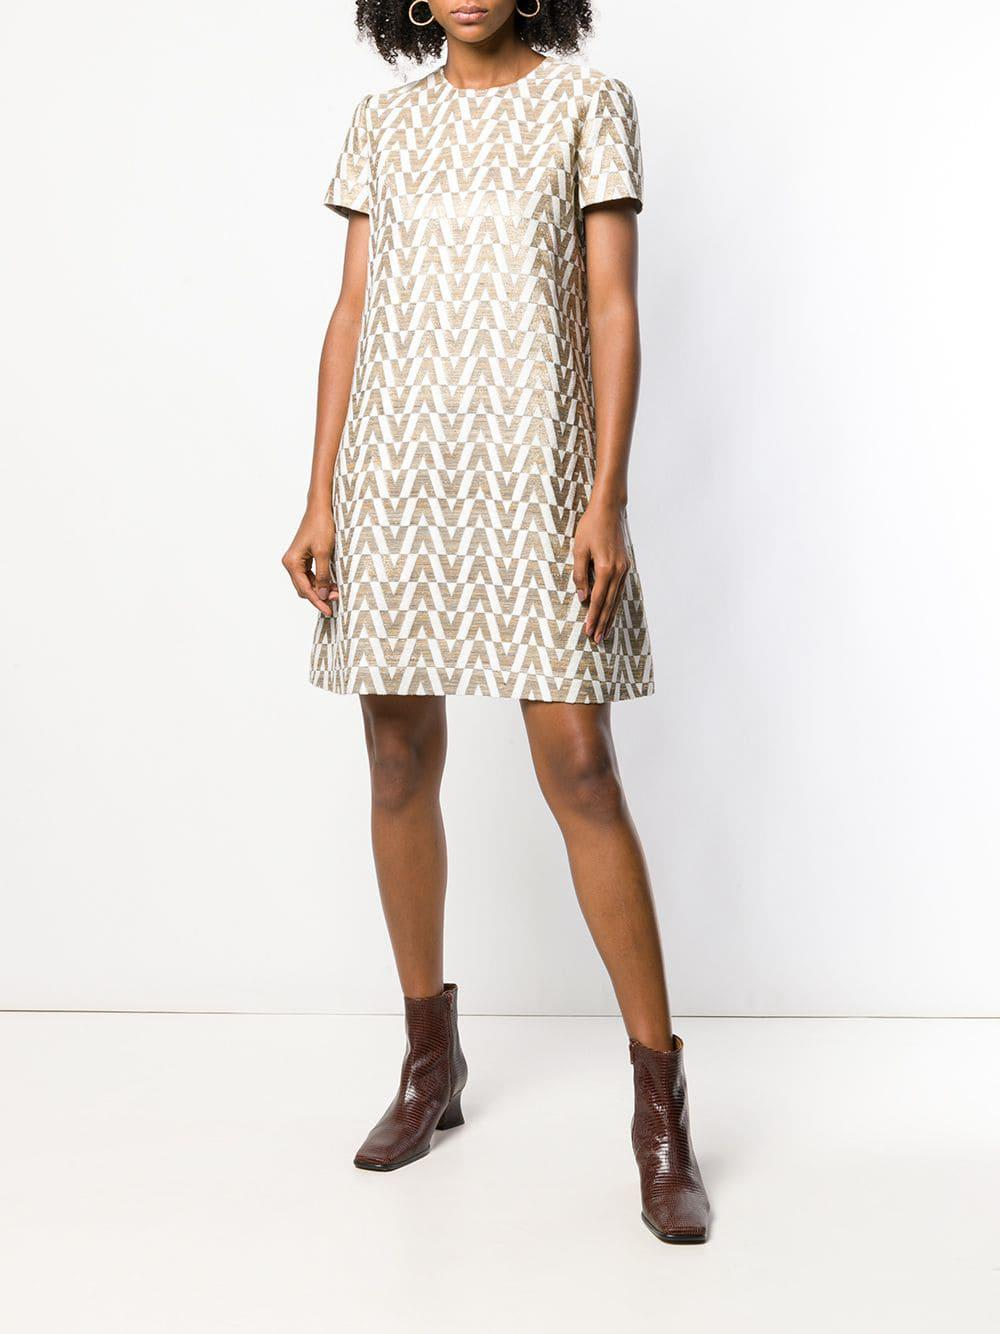 2b47bb9db83 Lyst - Valentino Optical Shift Dress in Natural